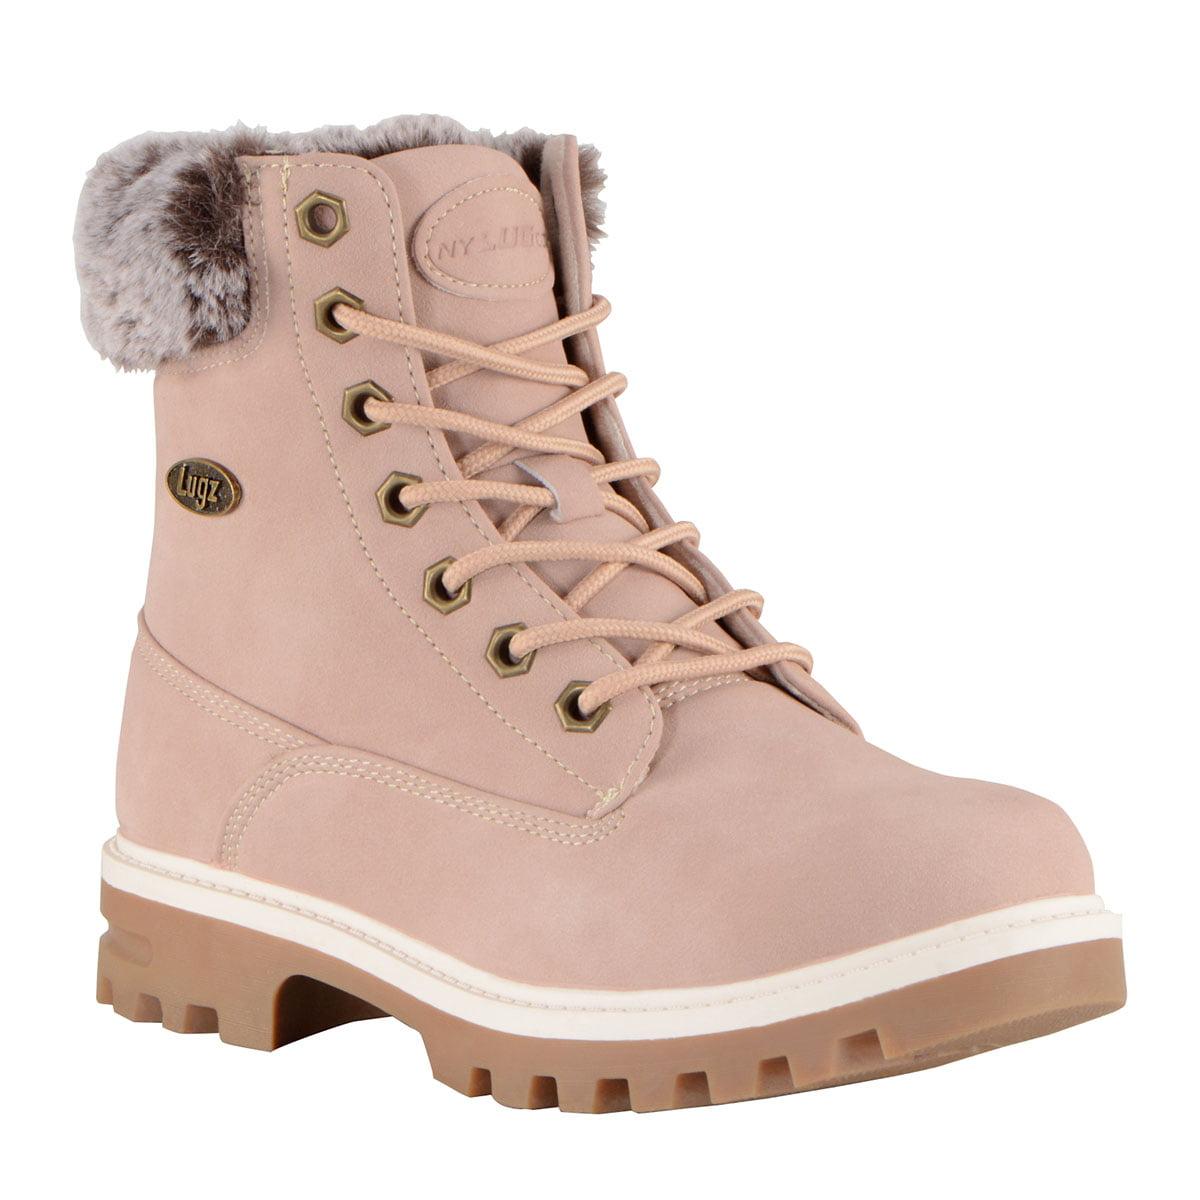 Lugz Kids \u0026 Baby Shoes - Walmart.com